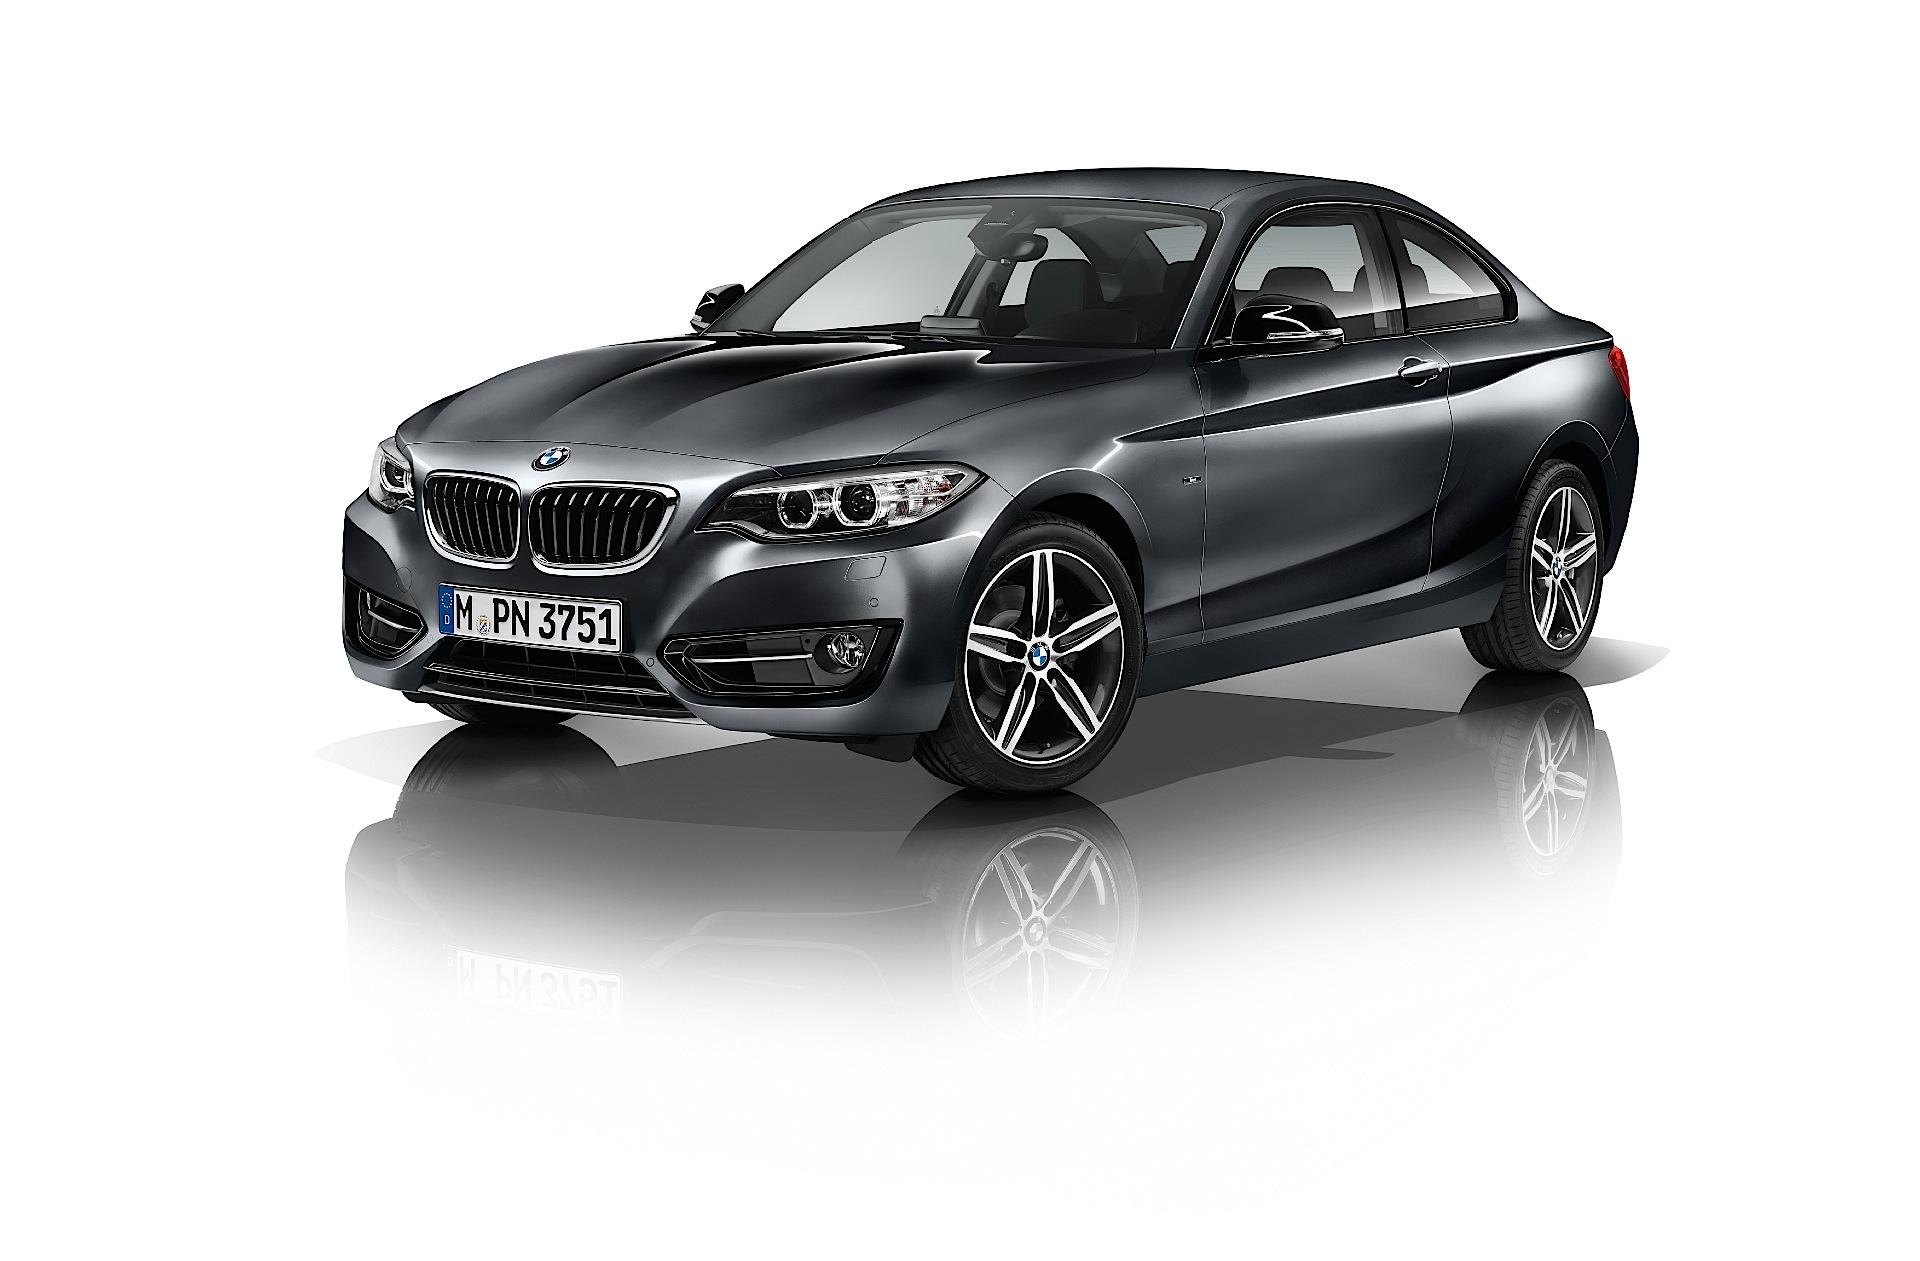 BMW 2 Series 5043 12